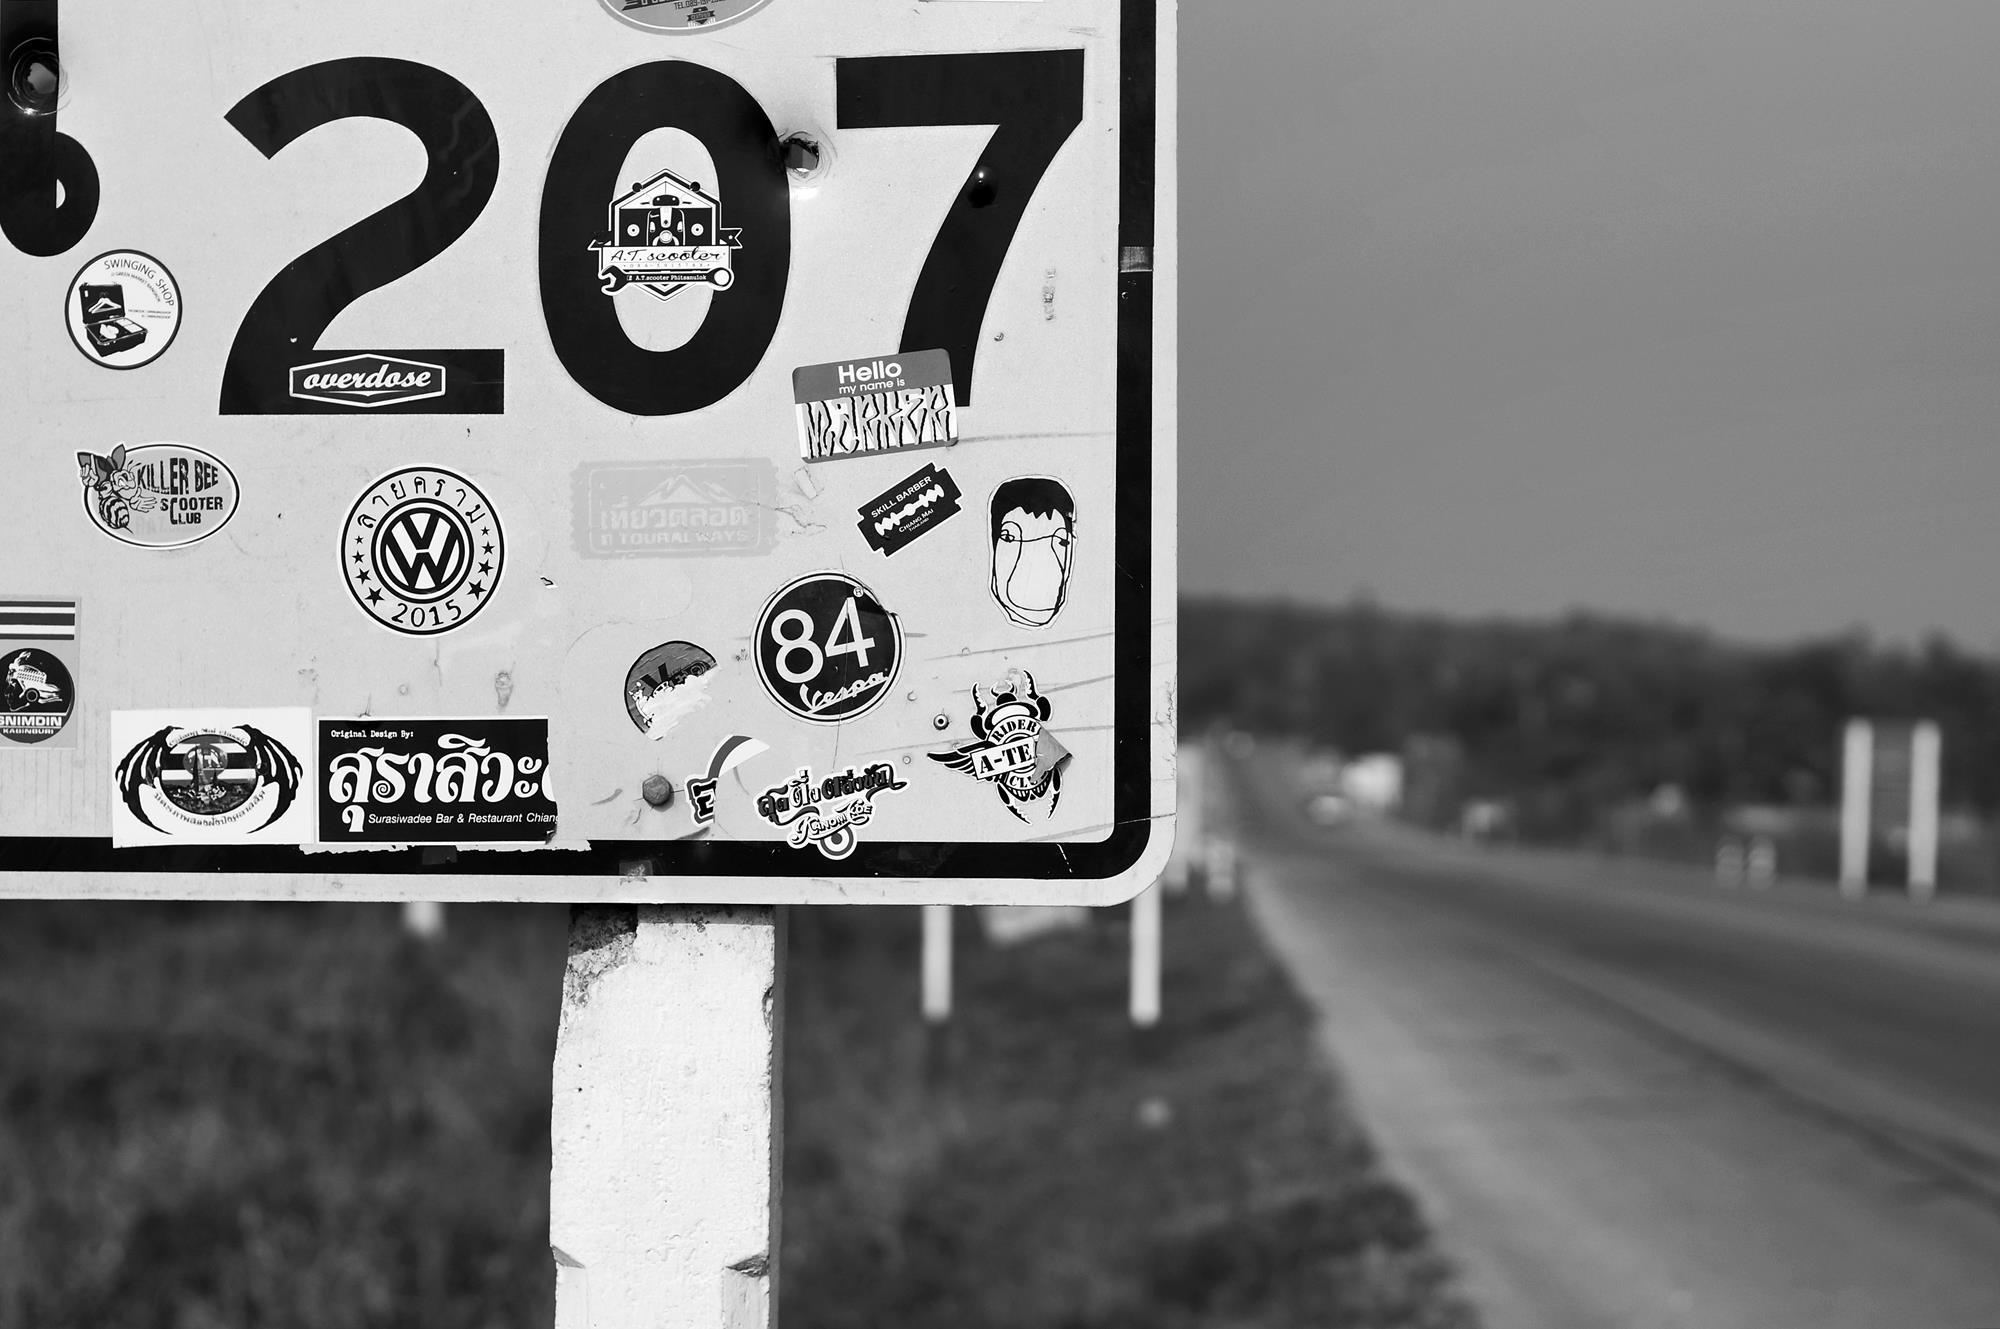 road sign between chiang mai and pai